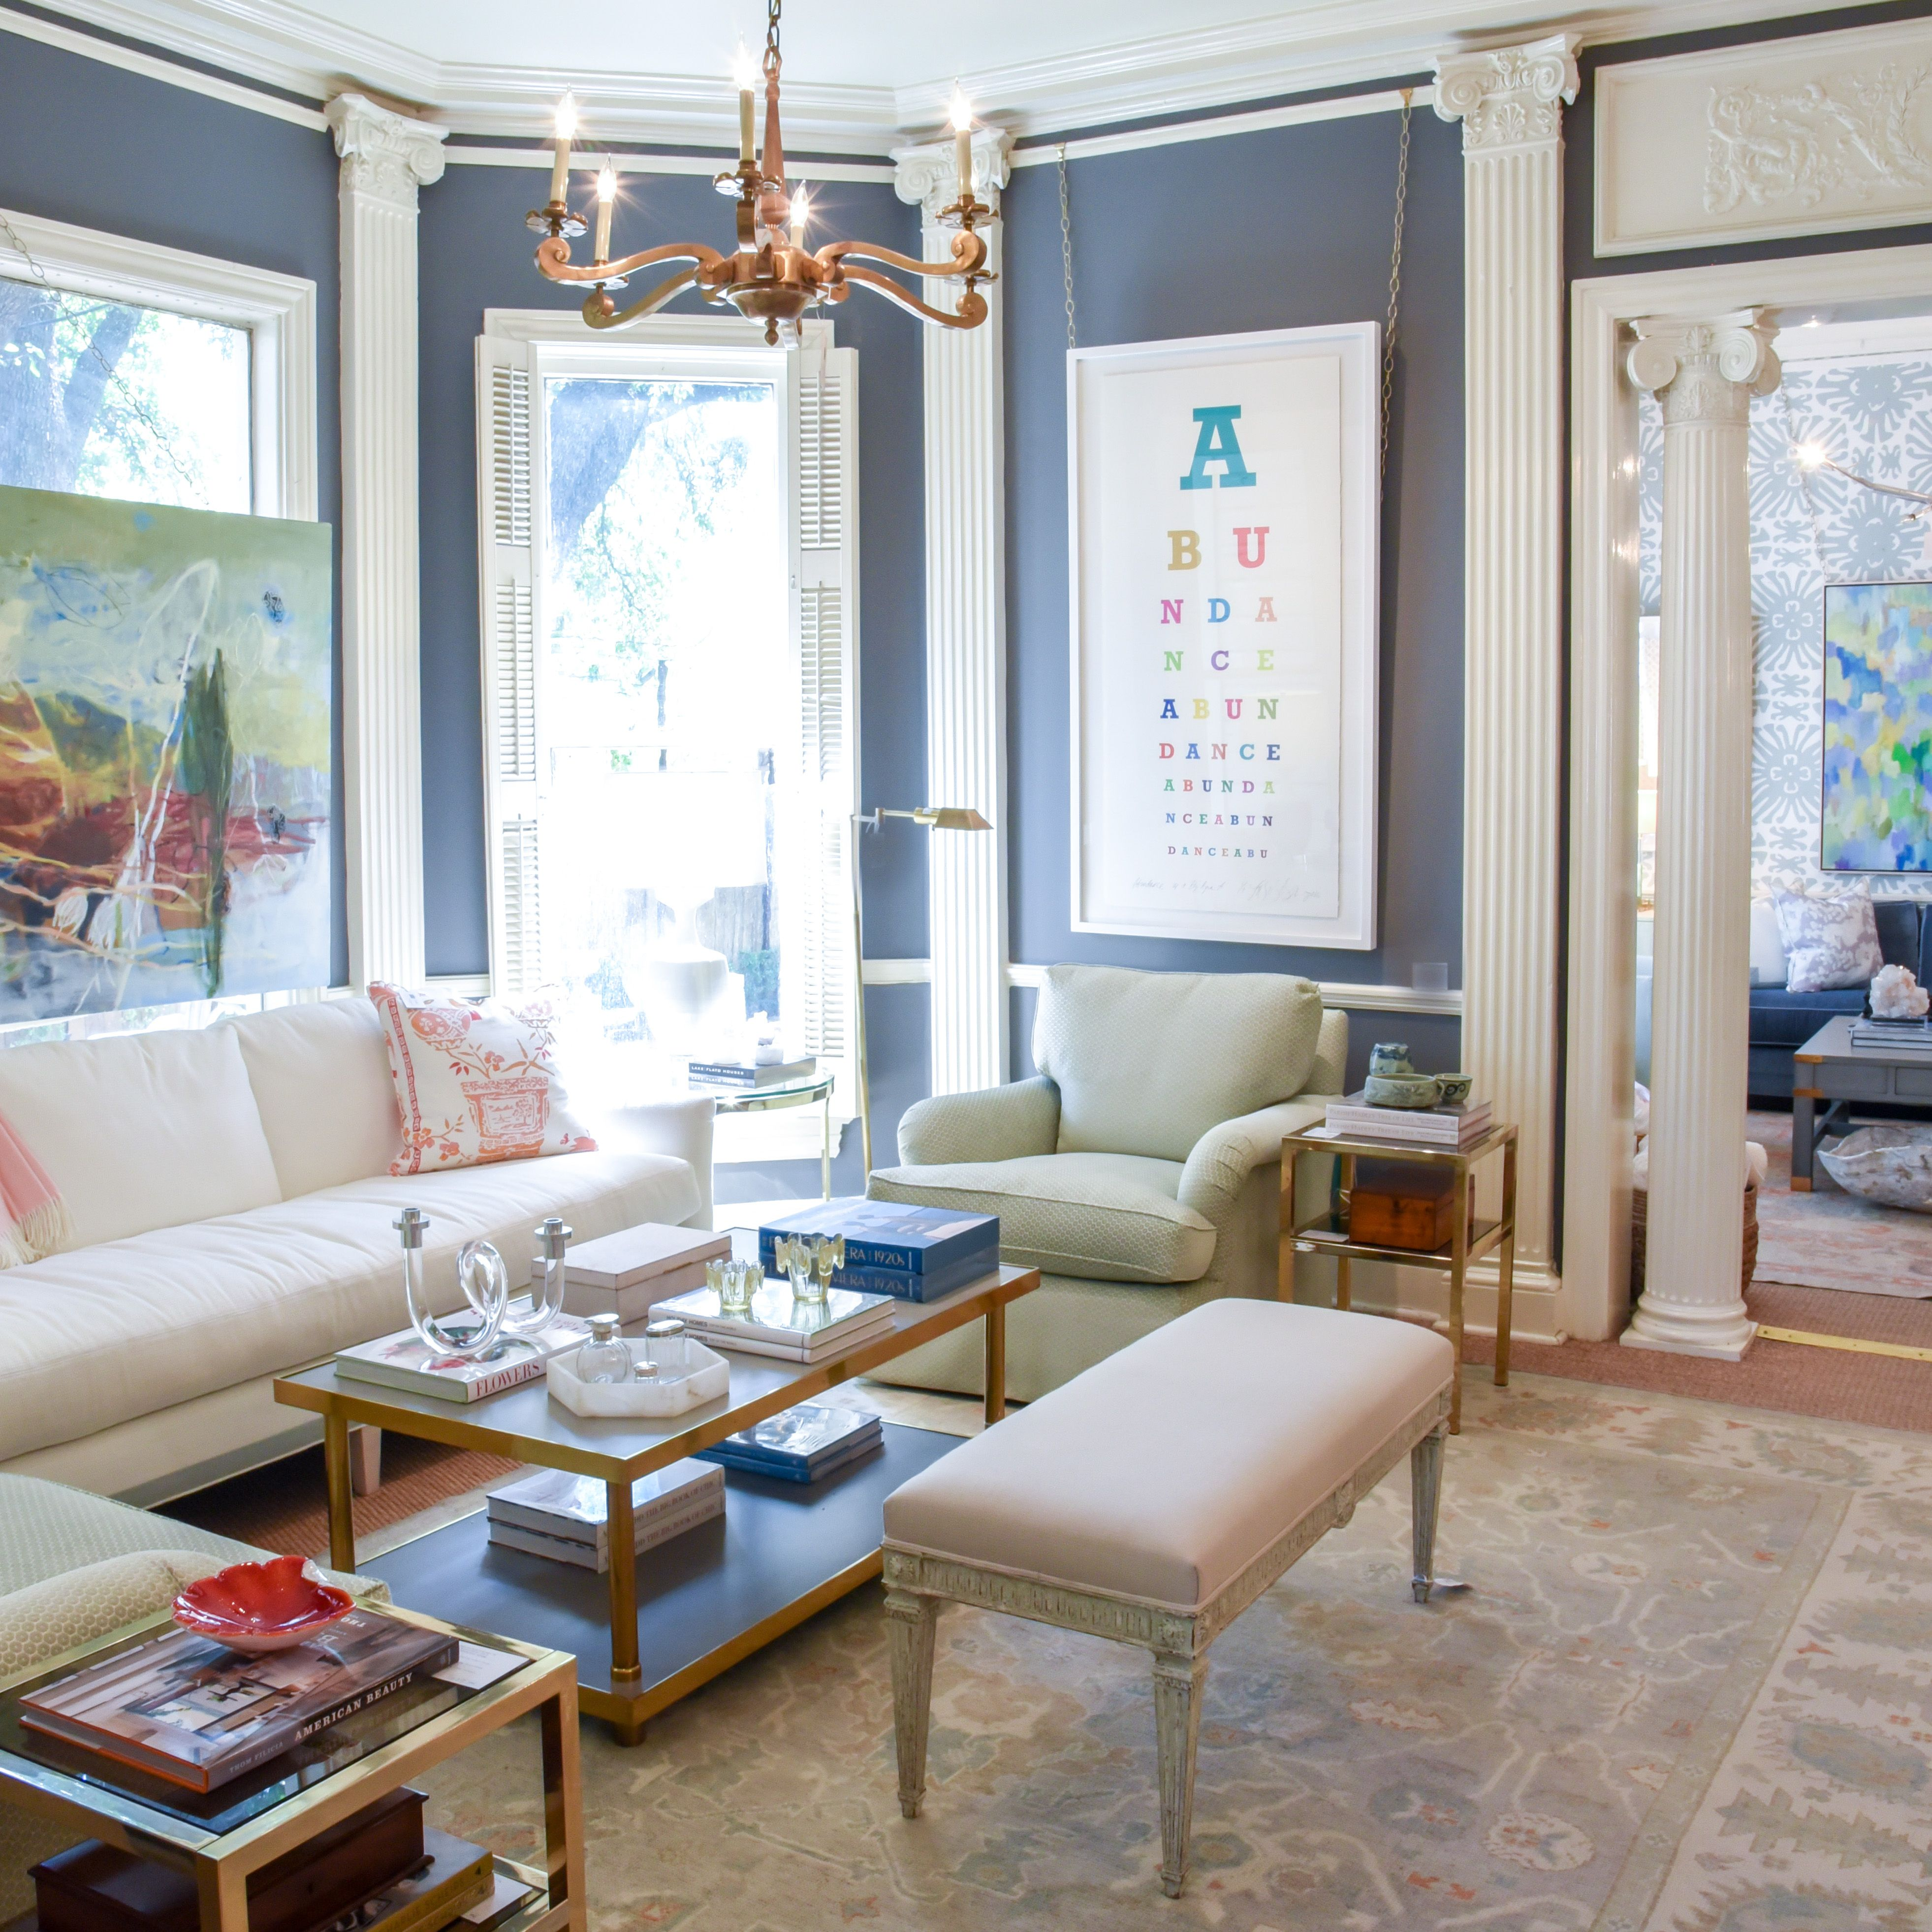 Benjamin Moore Colors For Your Living Room Decor: Benjamin Moore Steel Wool Gray Paint Color